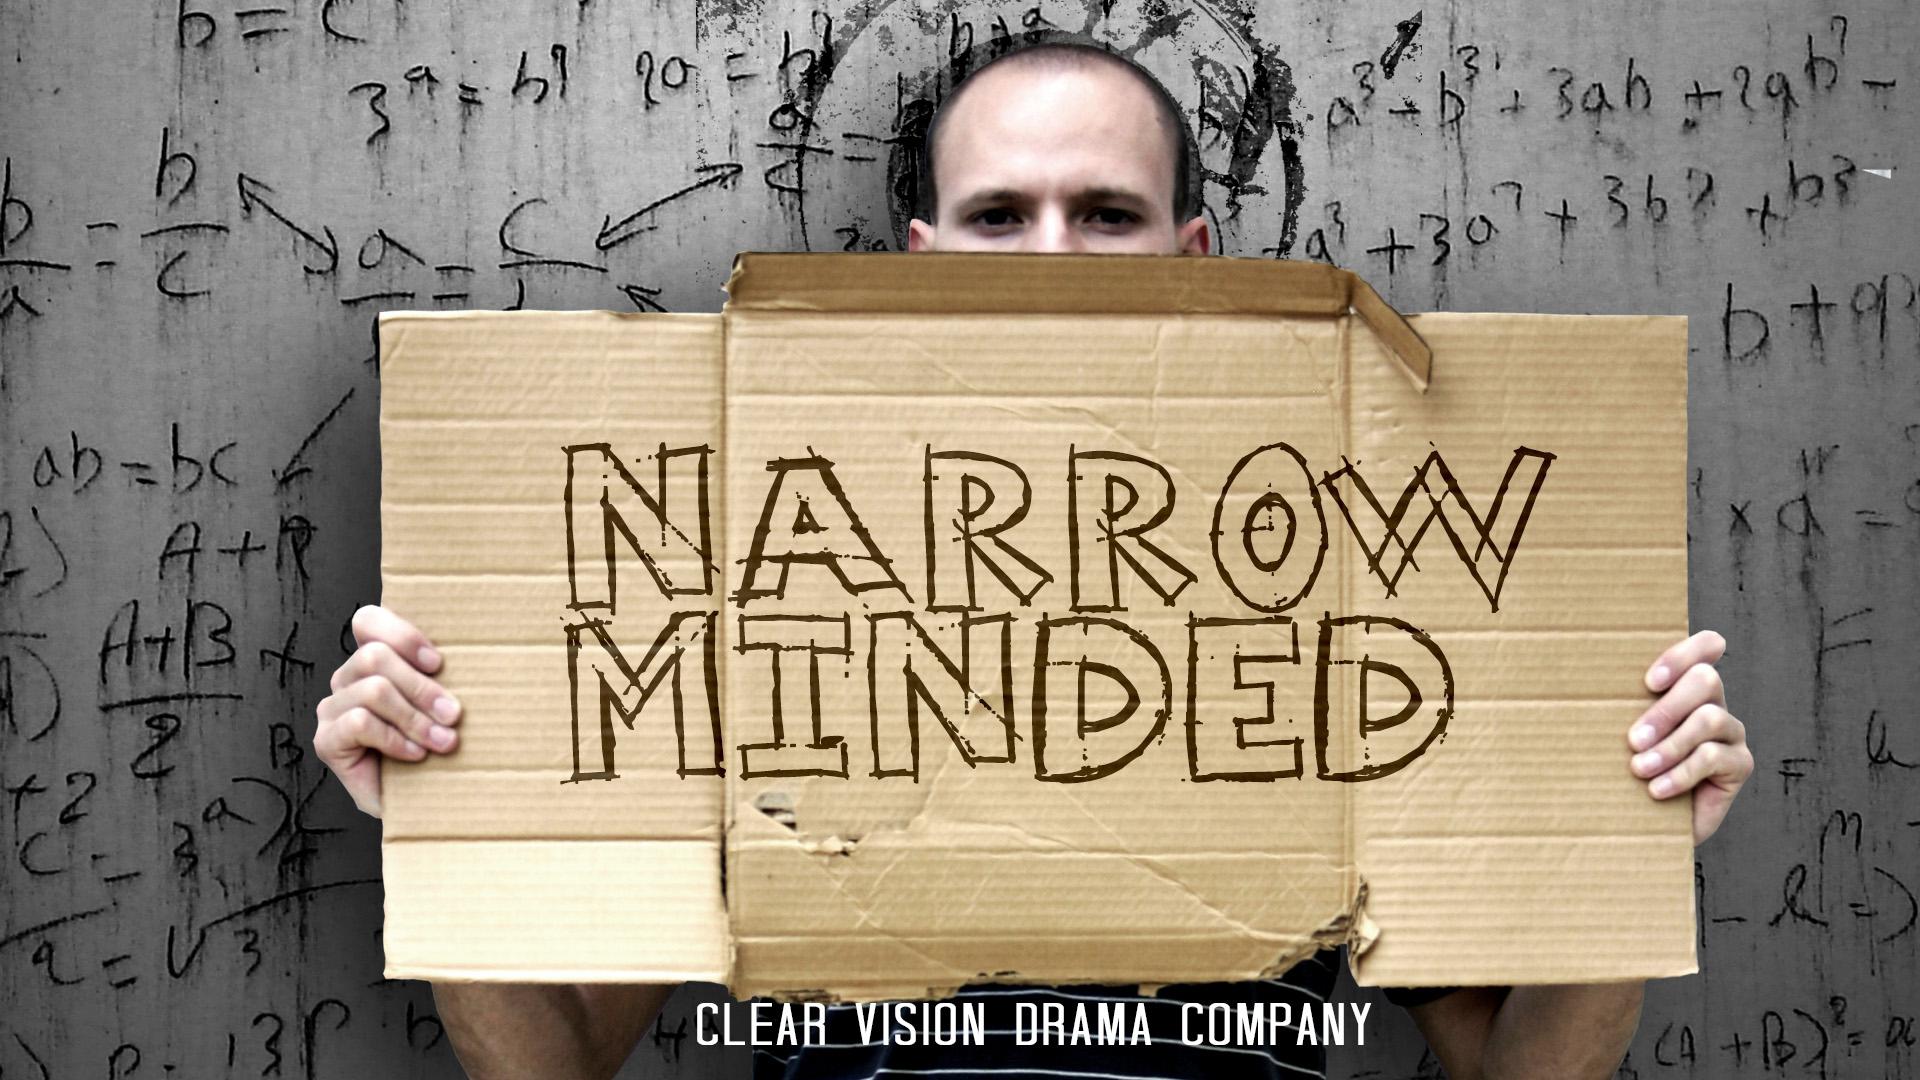 NarrowMinded.jpg